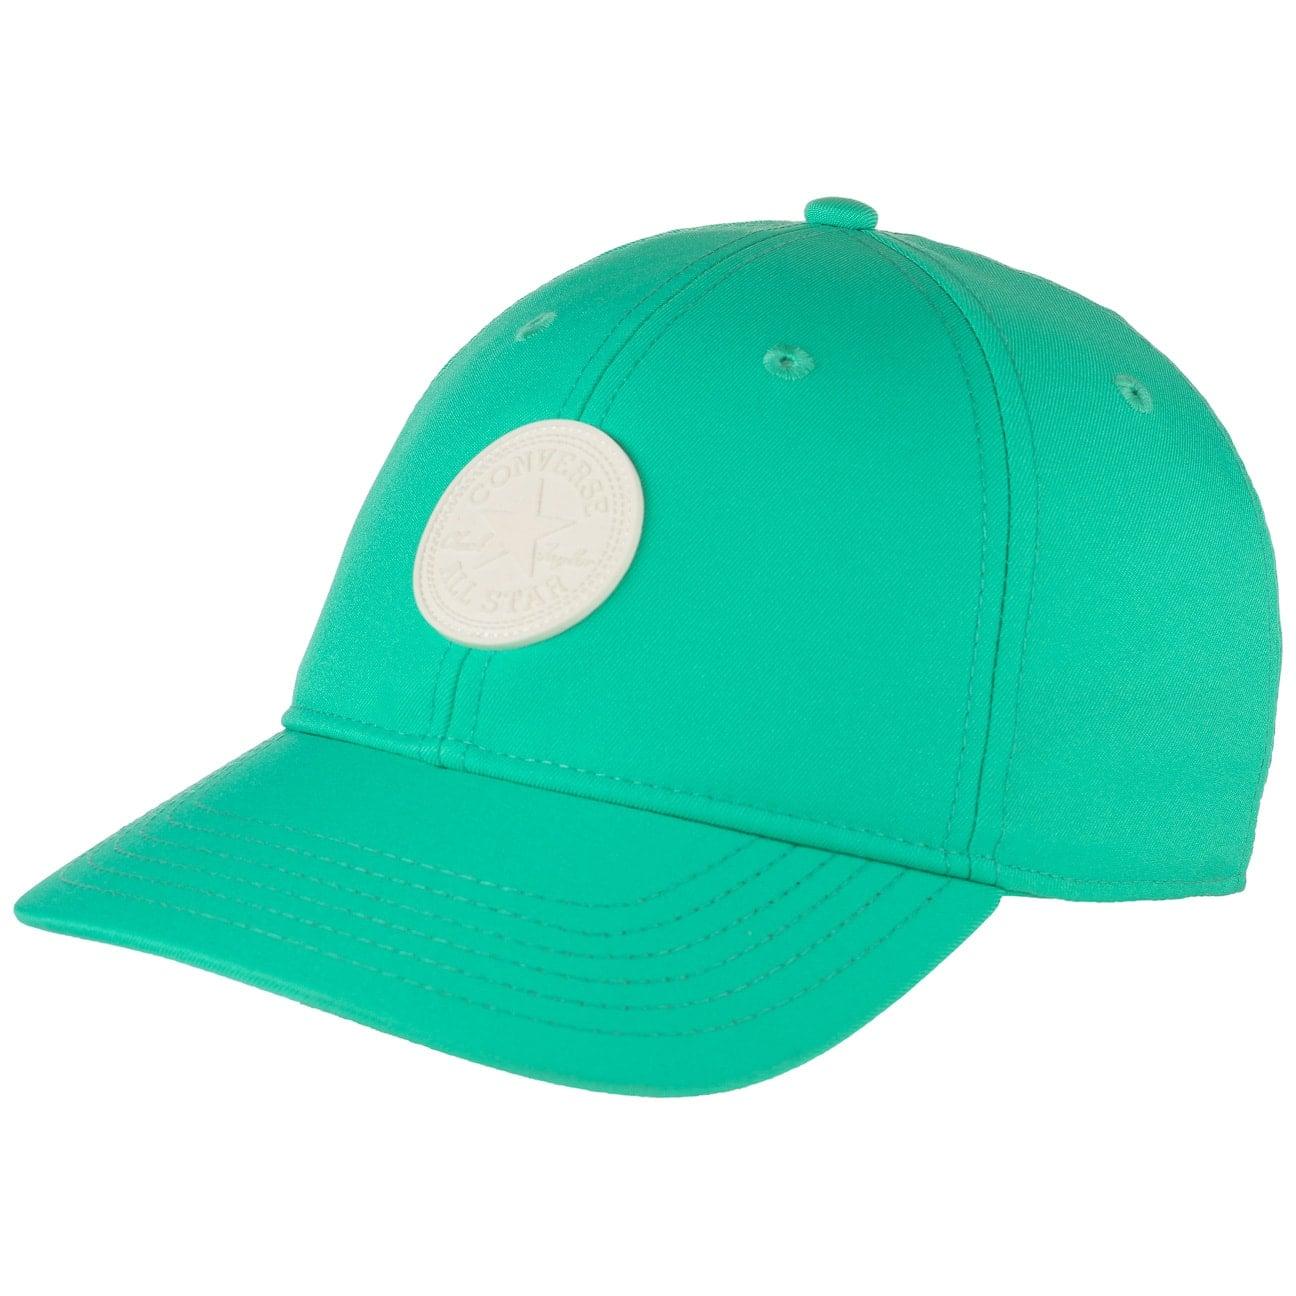 Casquette Dry Short Visor by Converse  baseball cap